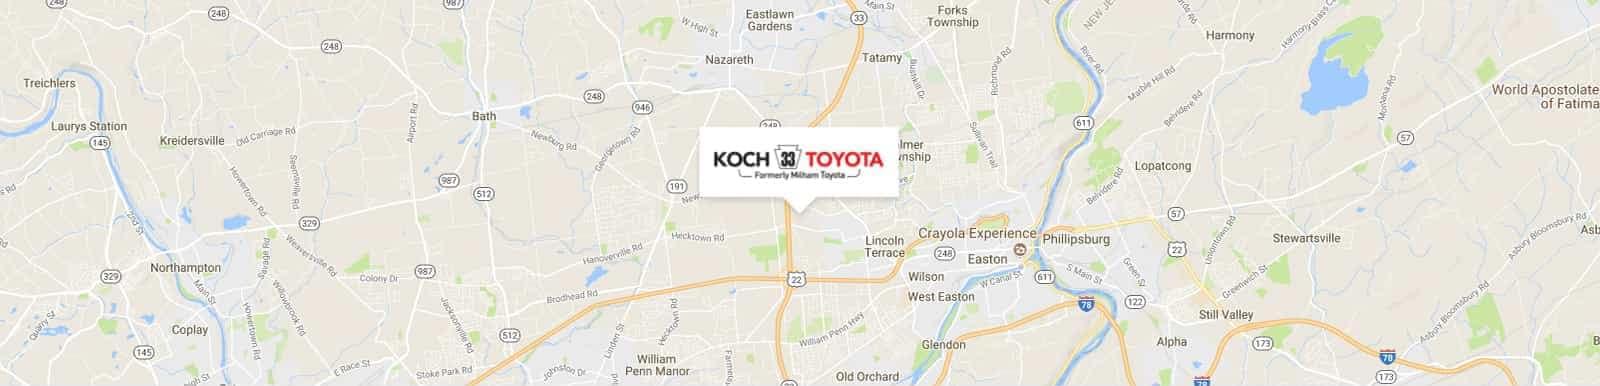 Koche33 Toyota Map image